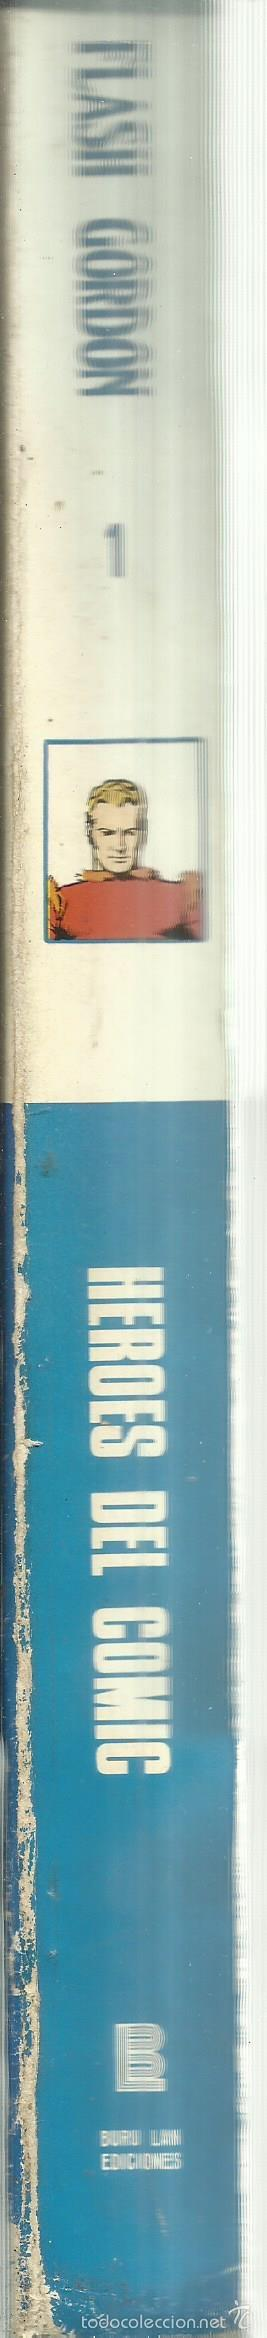 Cómics: FLASH GORDON. BURU LAN. SAN SEBASTIAN. 1972 - Foto 3 - 56250051